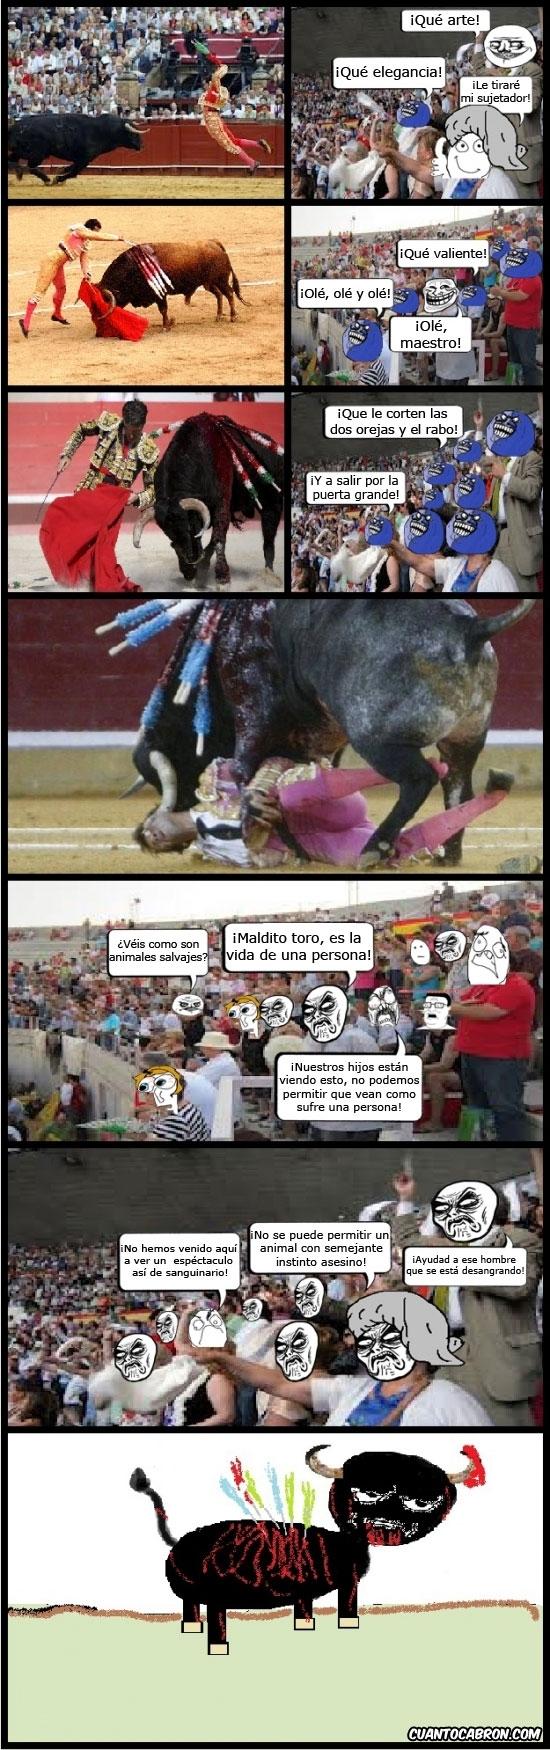 arte,corrida de toros,hipocresia,publico hipocrita,toreo,torero,toros,tortura animal